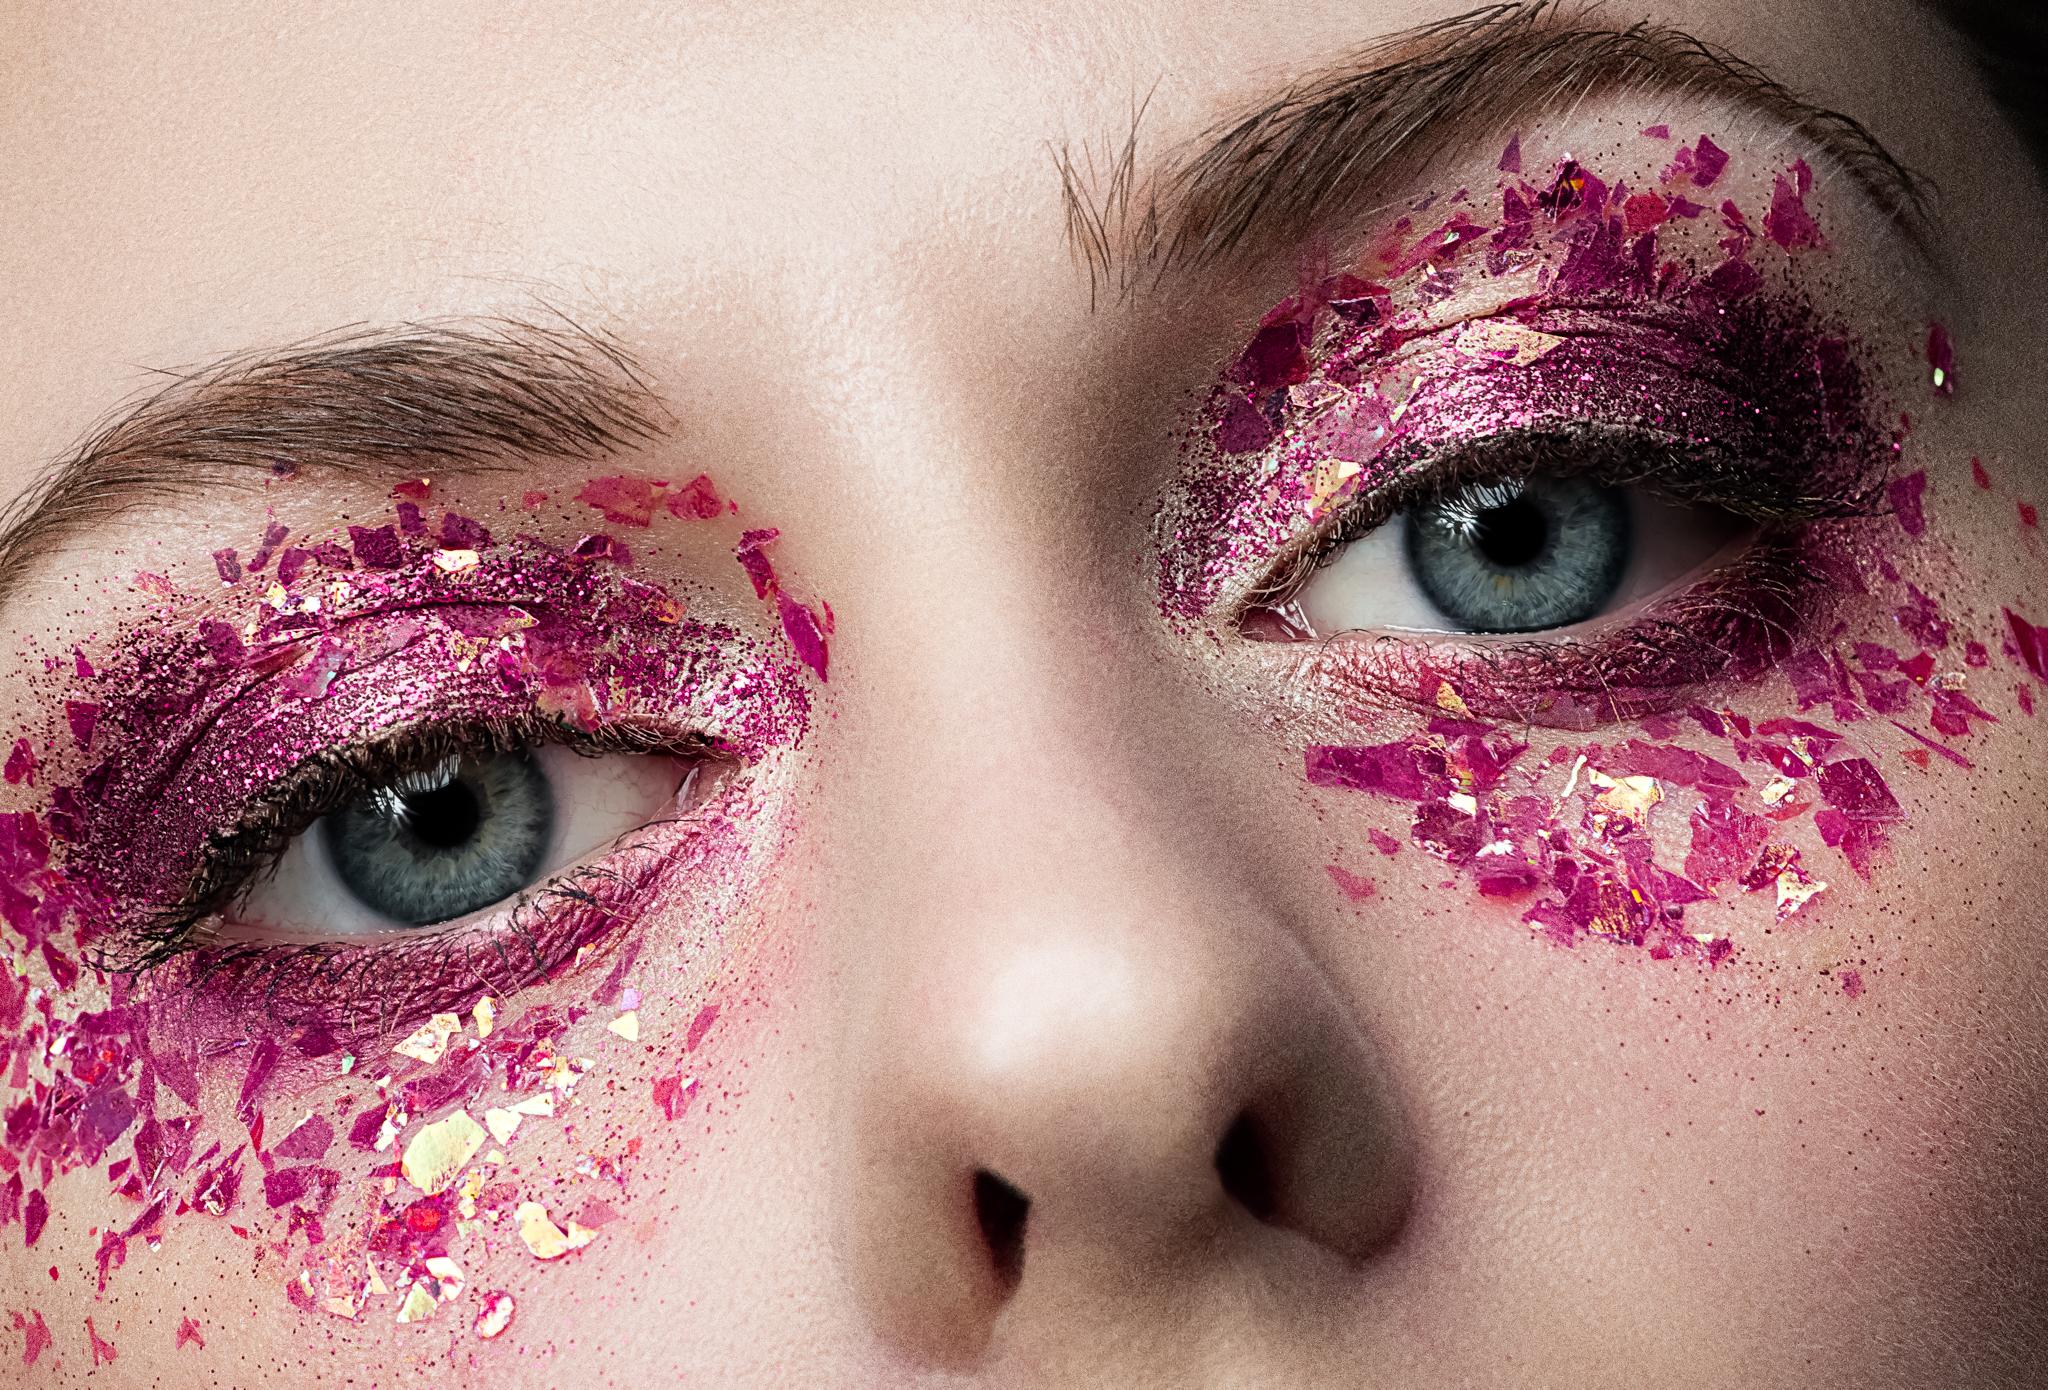 Utah Beauty & Product Photographer